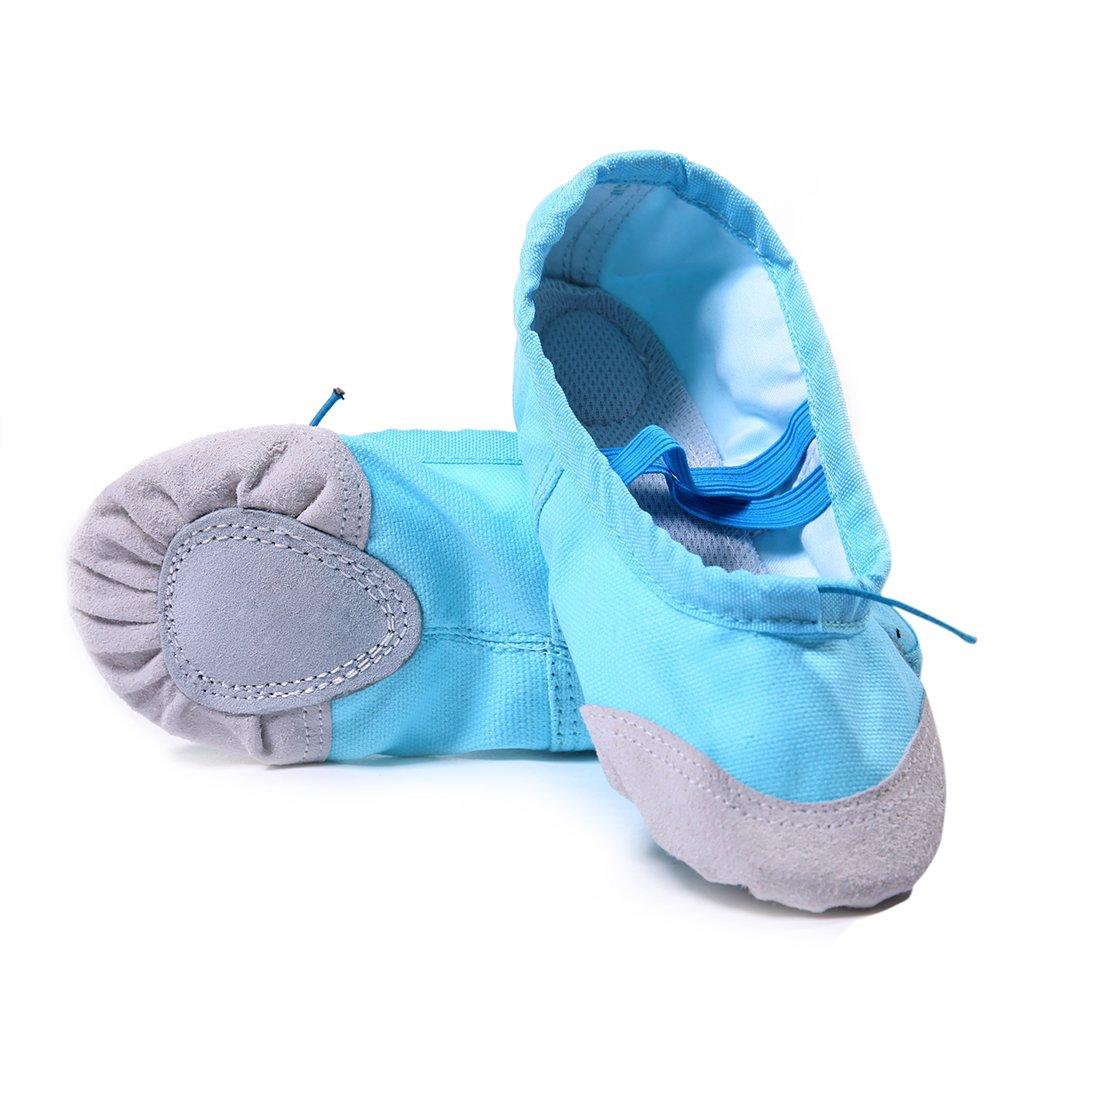 DoGeek Ballettschuhe Weich Spitzenschuhe Ballet Trainings SCHL?ppchen Schuhe f¨¹r M?dchen/Damen in Den Gr??en 24-40(Bitte Bestellen Sie Eine Nummer gr?sser)